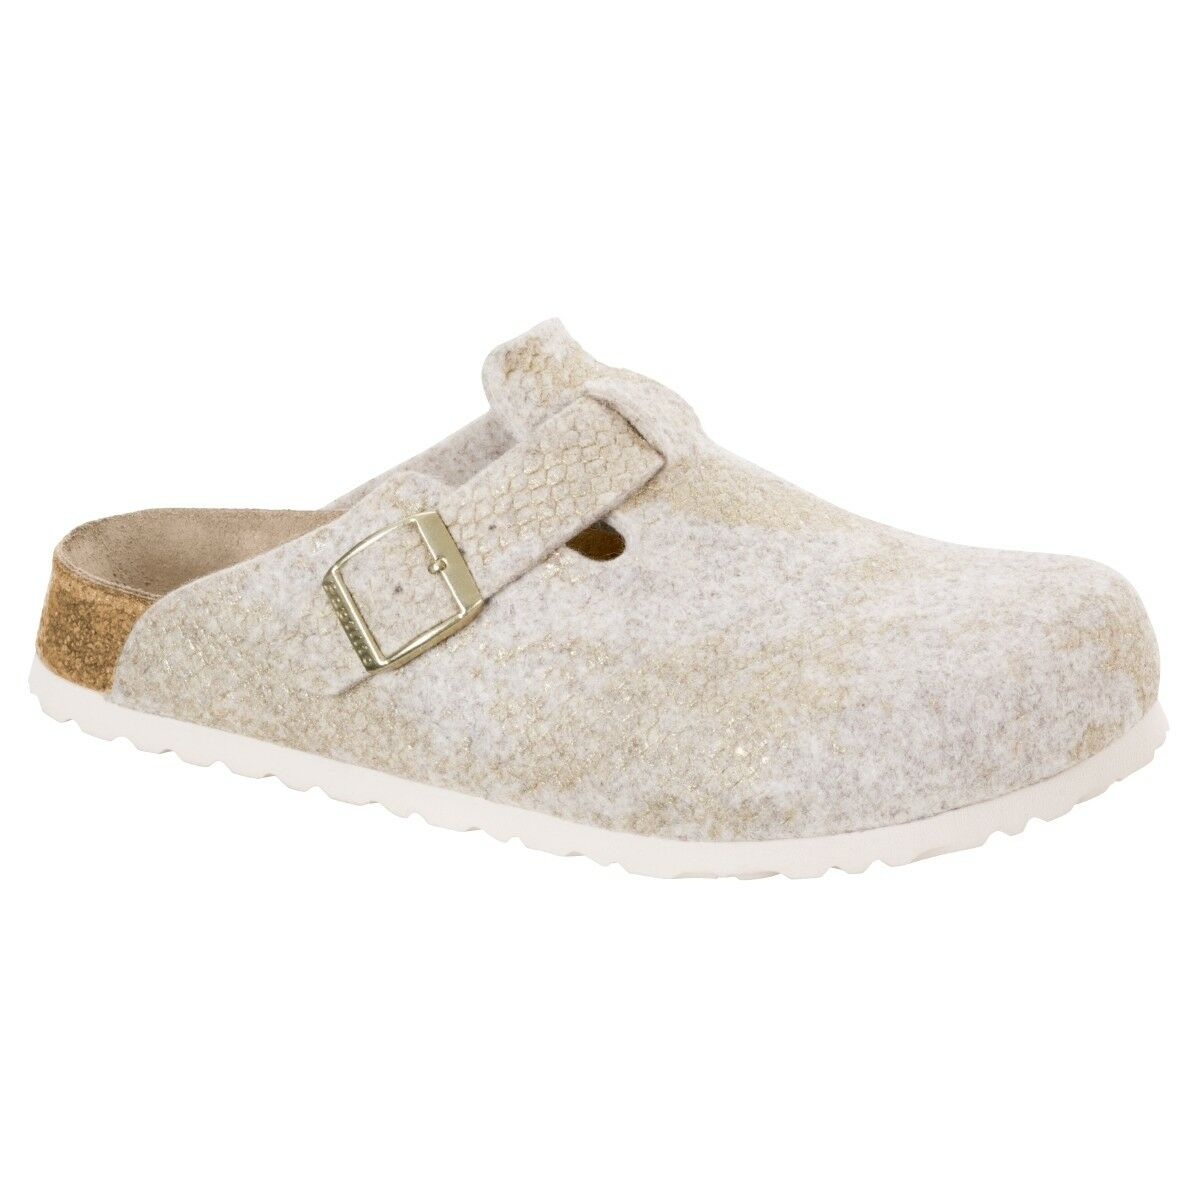 Birkenstock Papillio Boston Wollfilz Schuhe Pantoletten Weite schmal 1007101